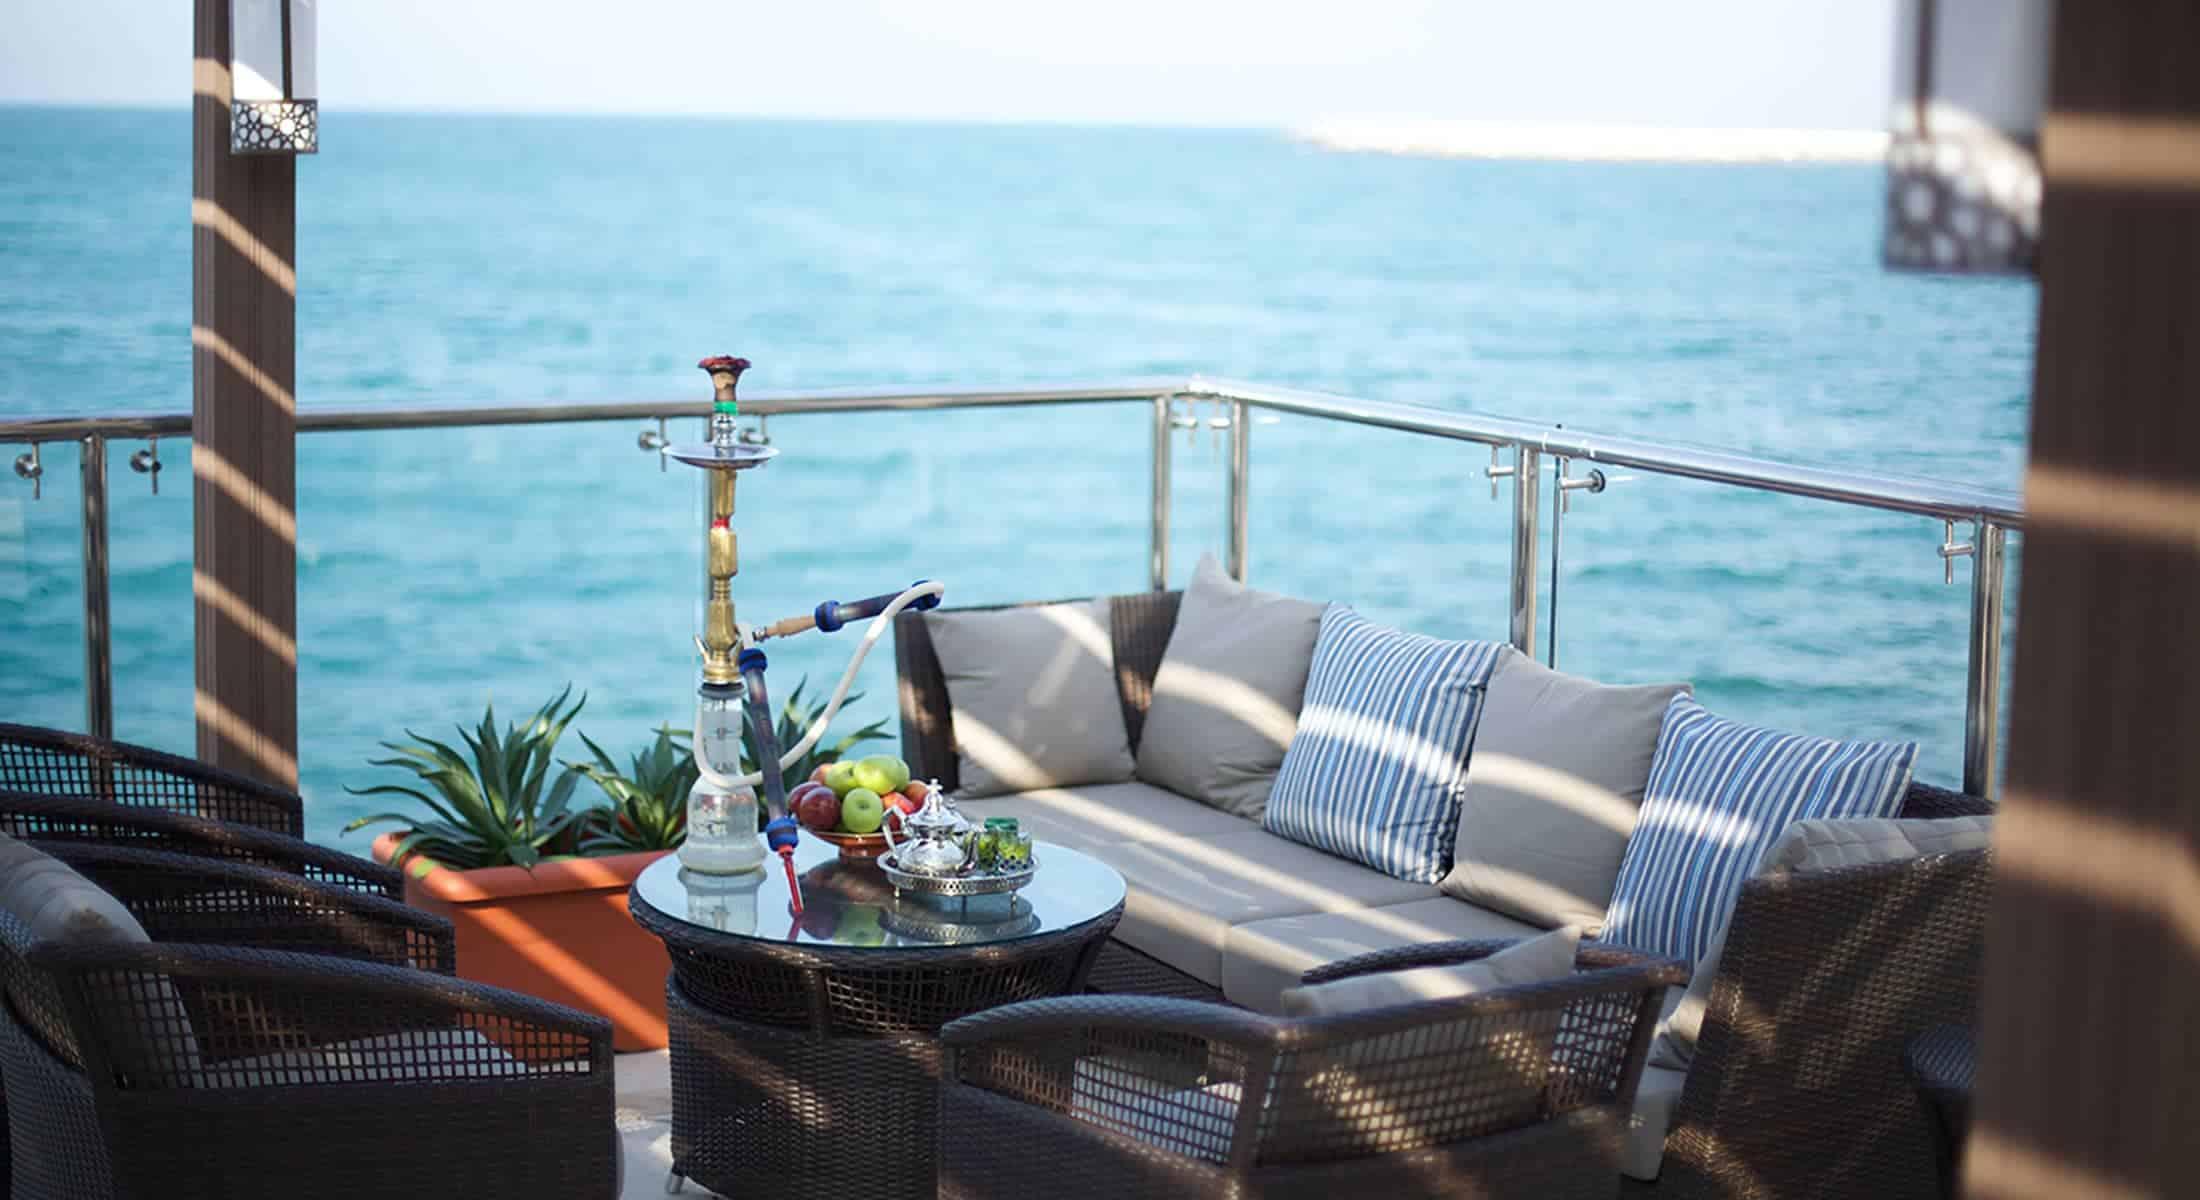 Amouage lounge & terrace, Ras Al Khaimah